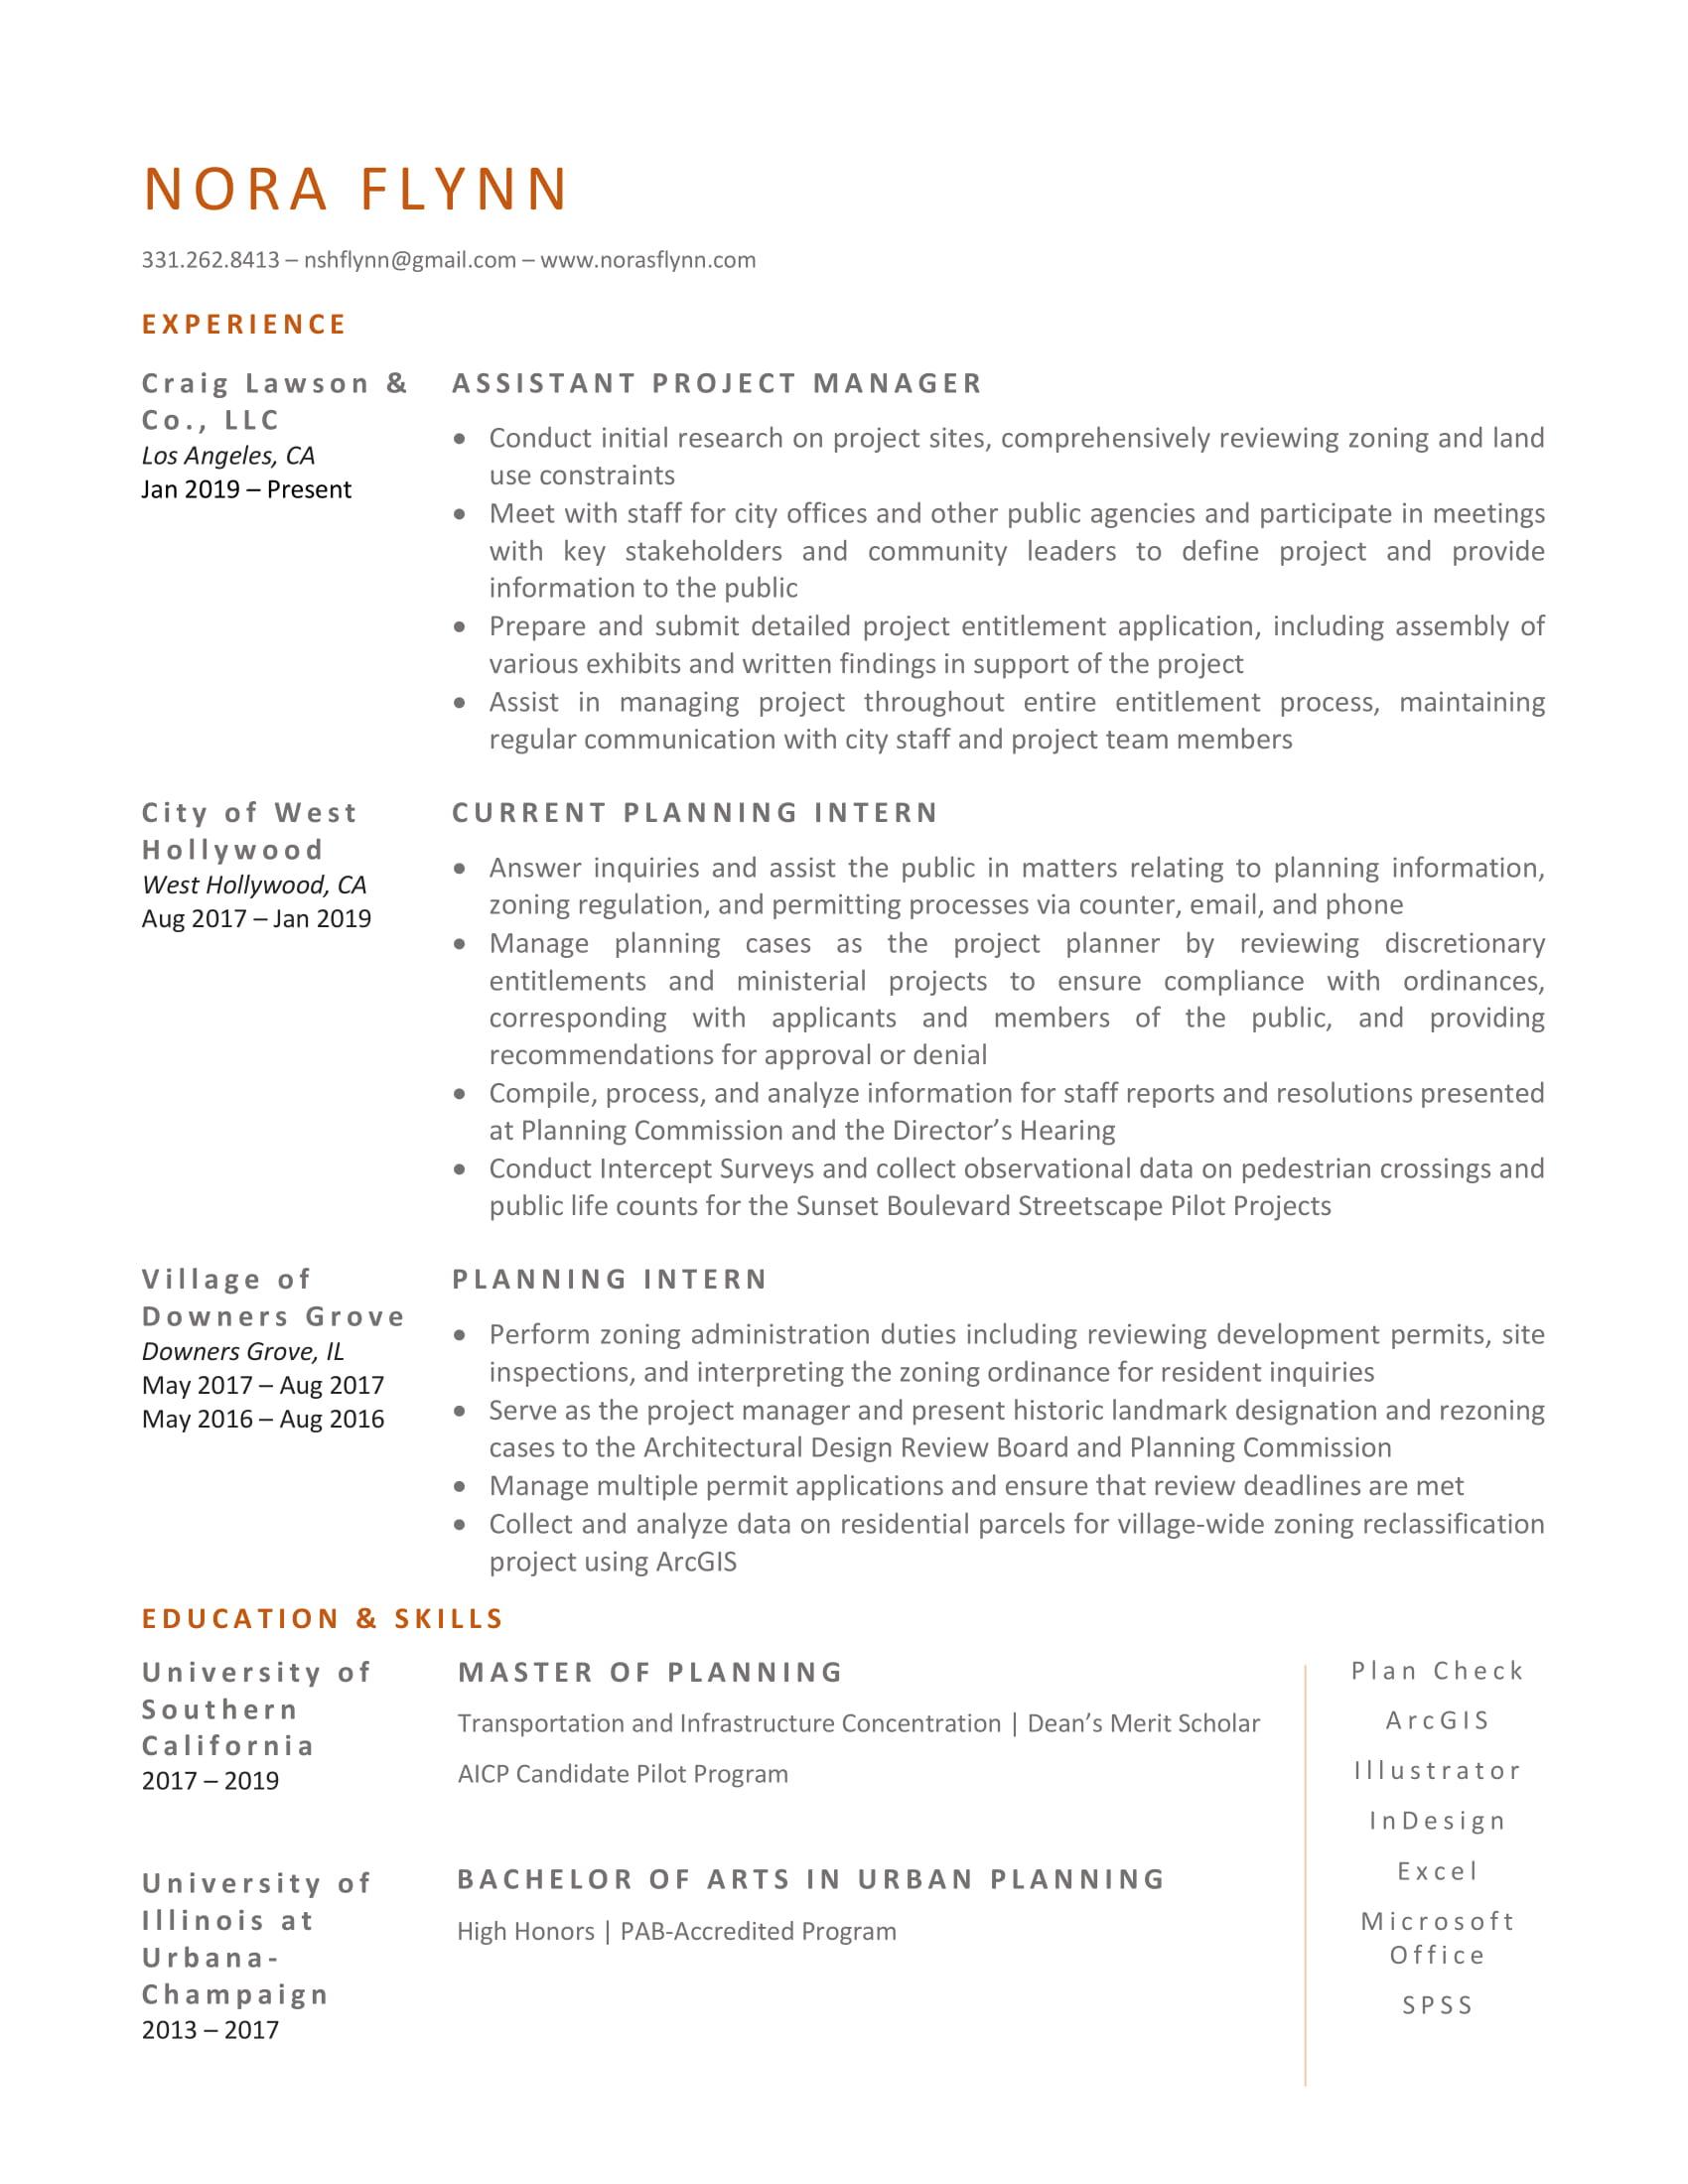 Resume 032919-1.jpg